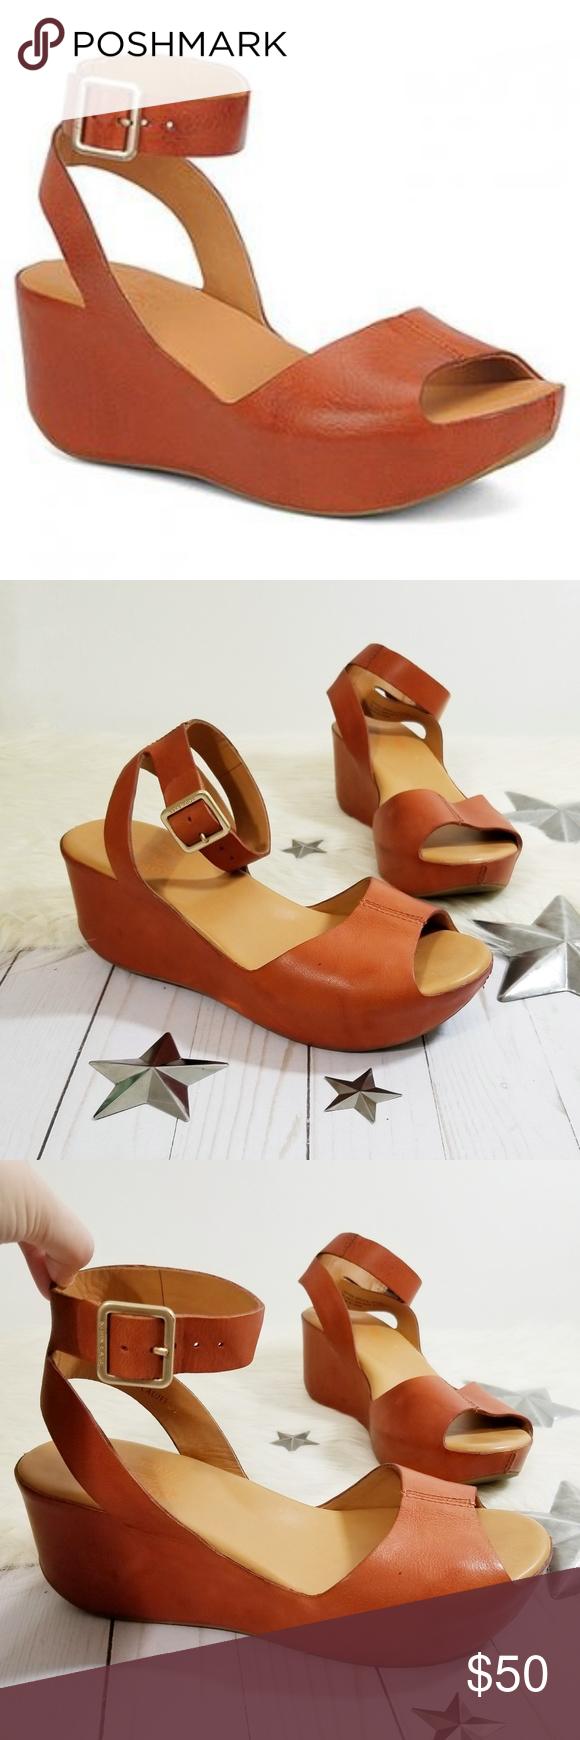 2b764743523 Kork-Ease Carolyne wedge sandals Rust orange ankle Kork-ease Carolyne style  wedges.